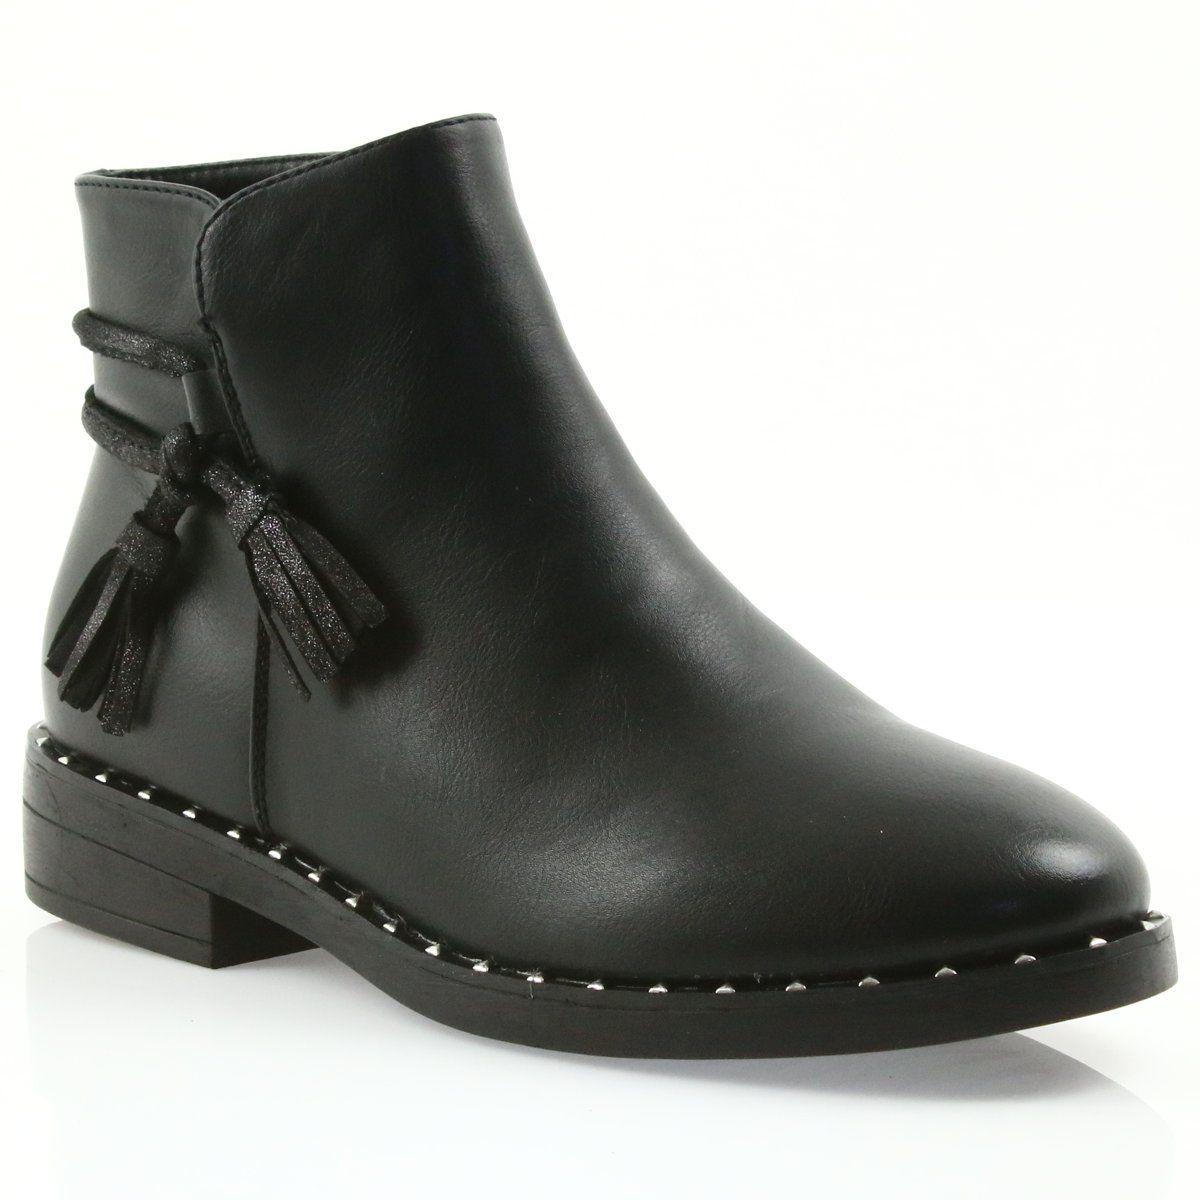 Botki Z Fredzlami Filippo Czarne 461 Boots Boot Shoes Women Women Shoes